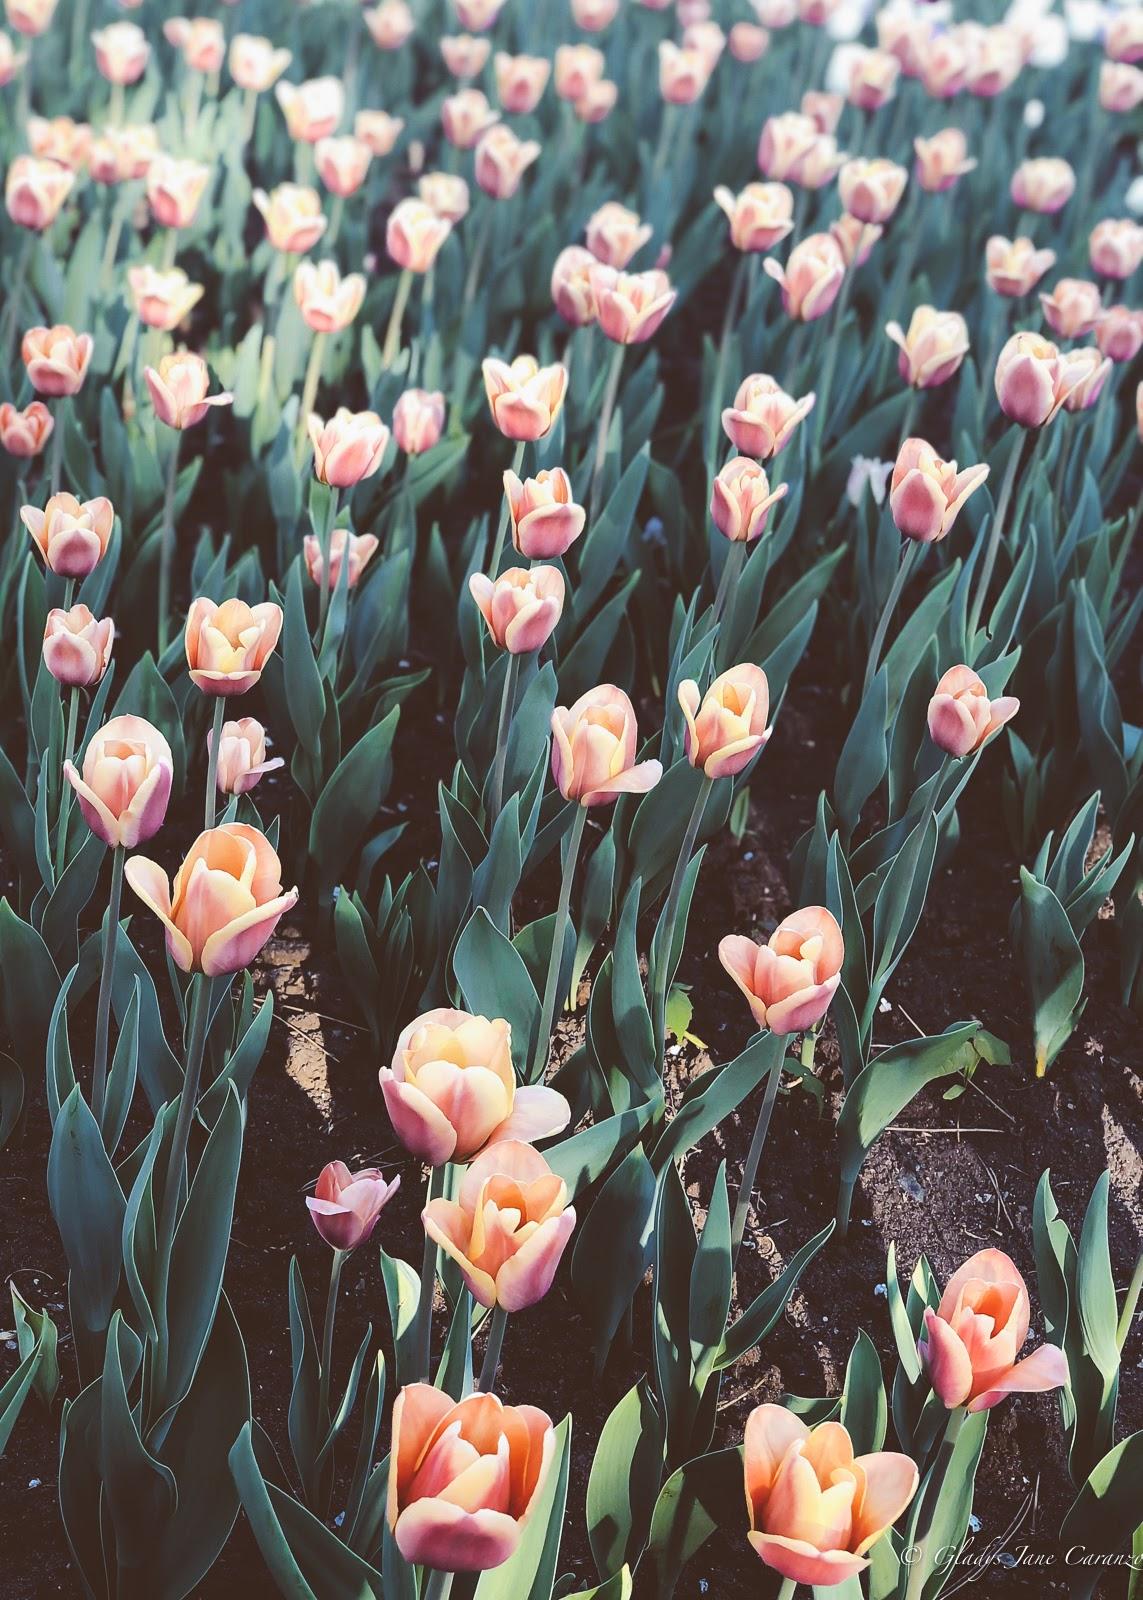 Tulip Festival: Things to Do in Ottawa, Ontario, Canada